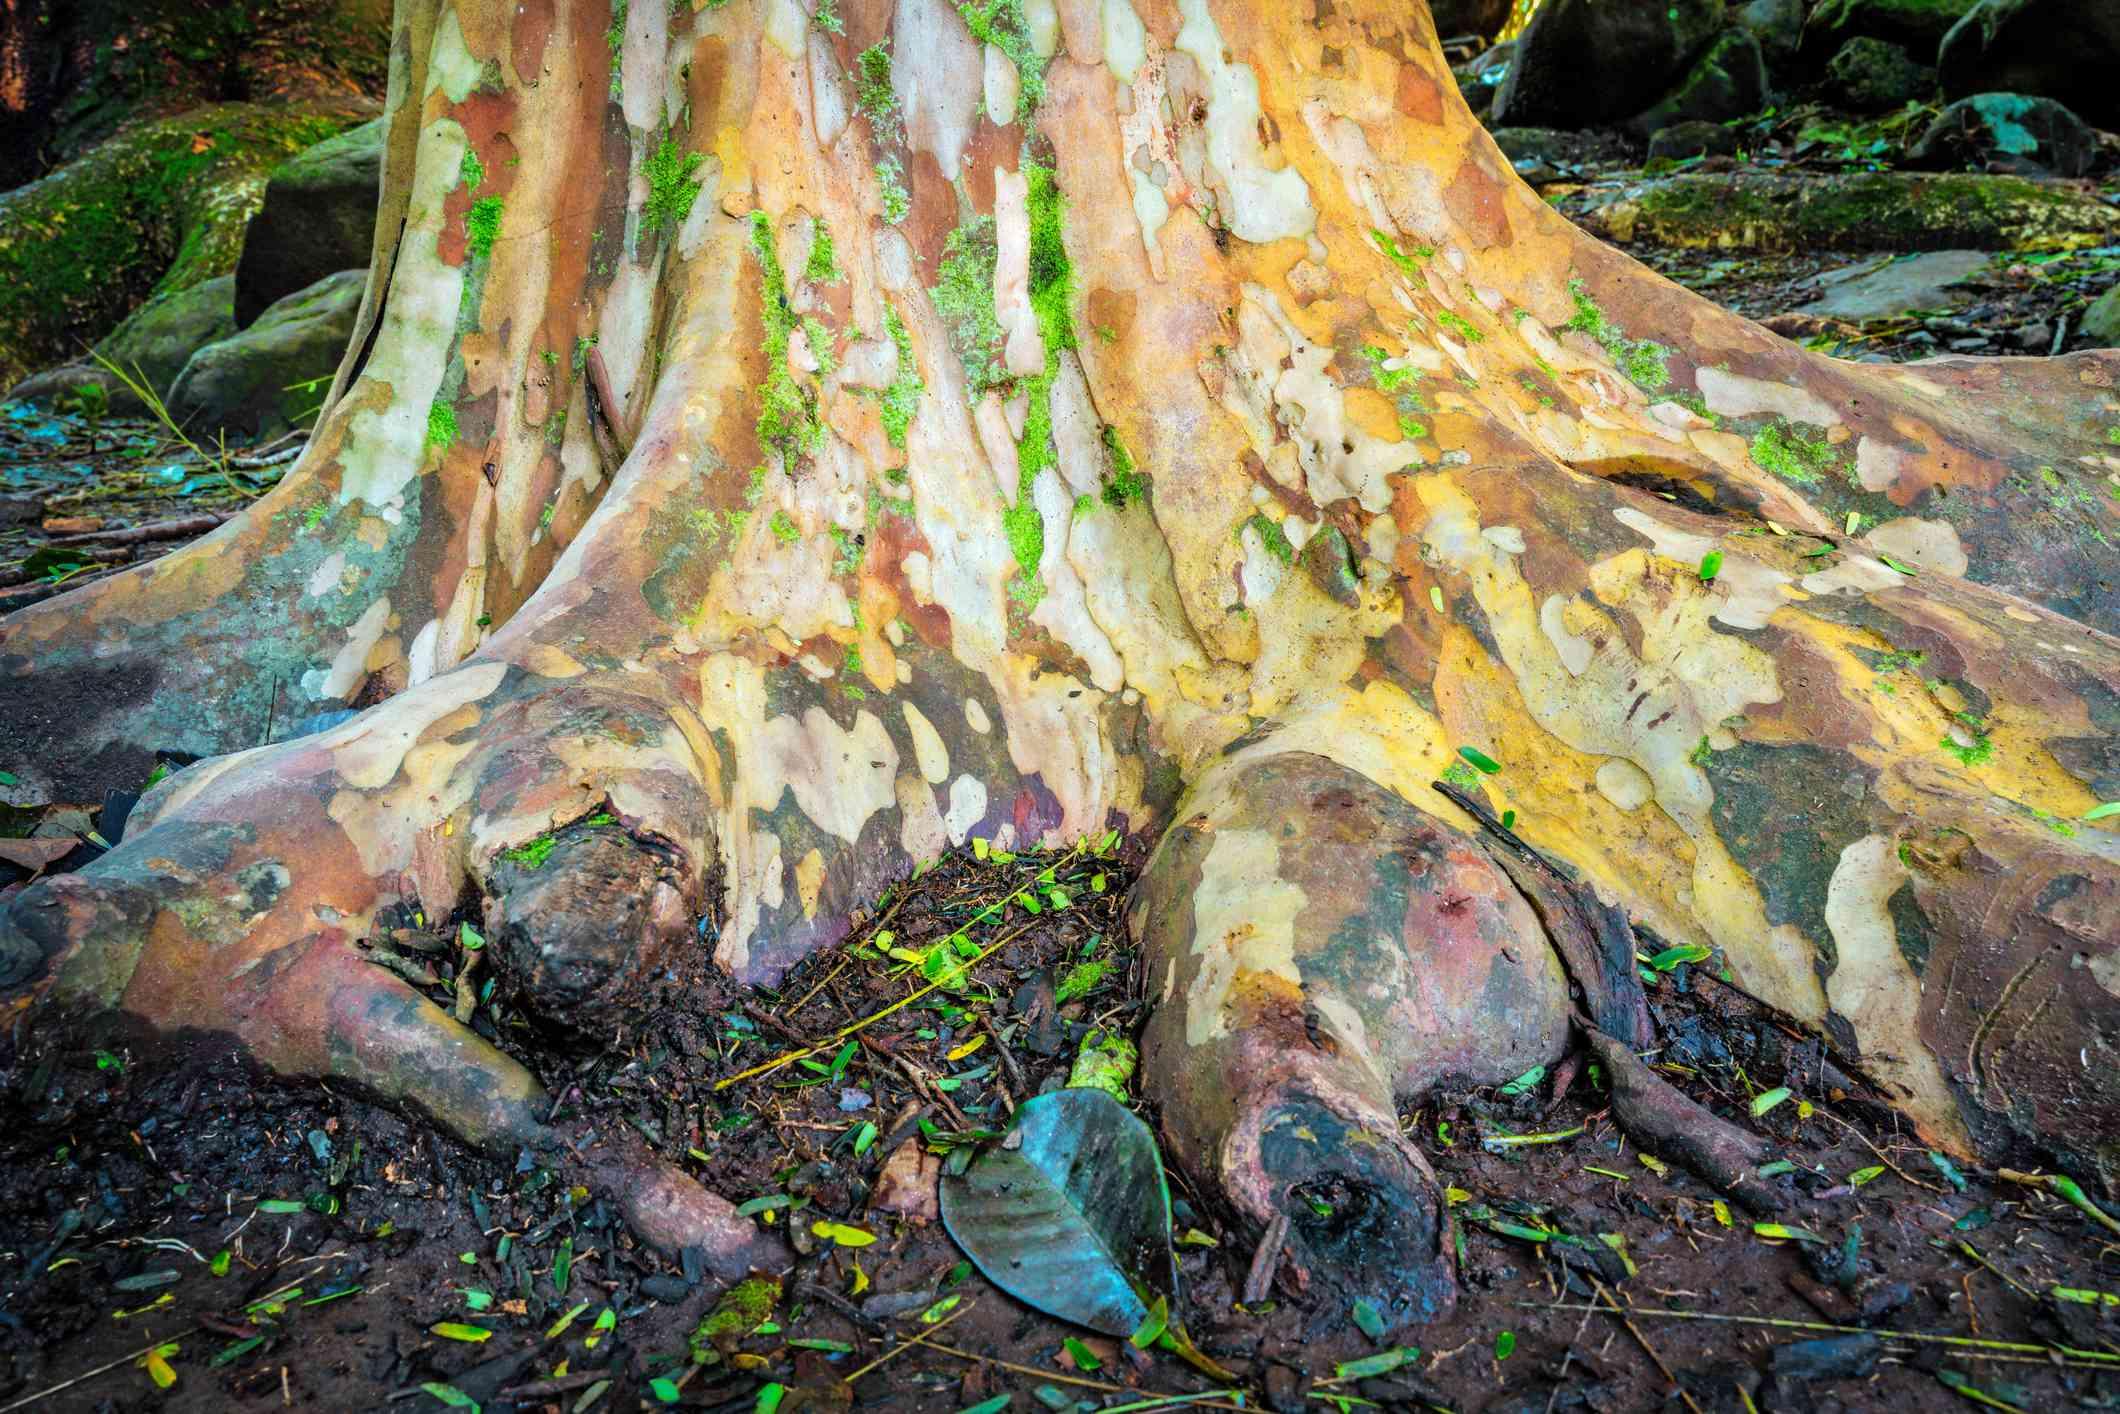 Eucalyptus tree base